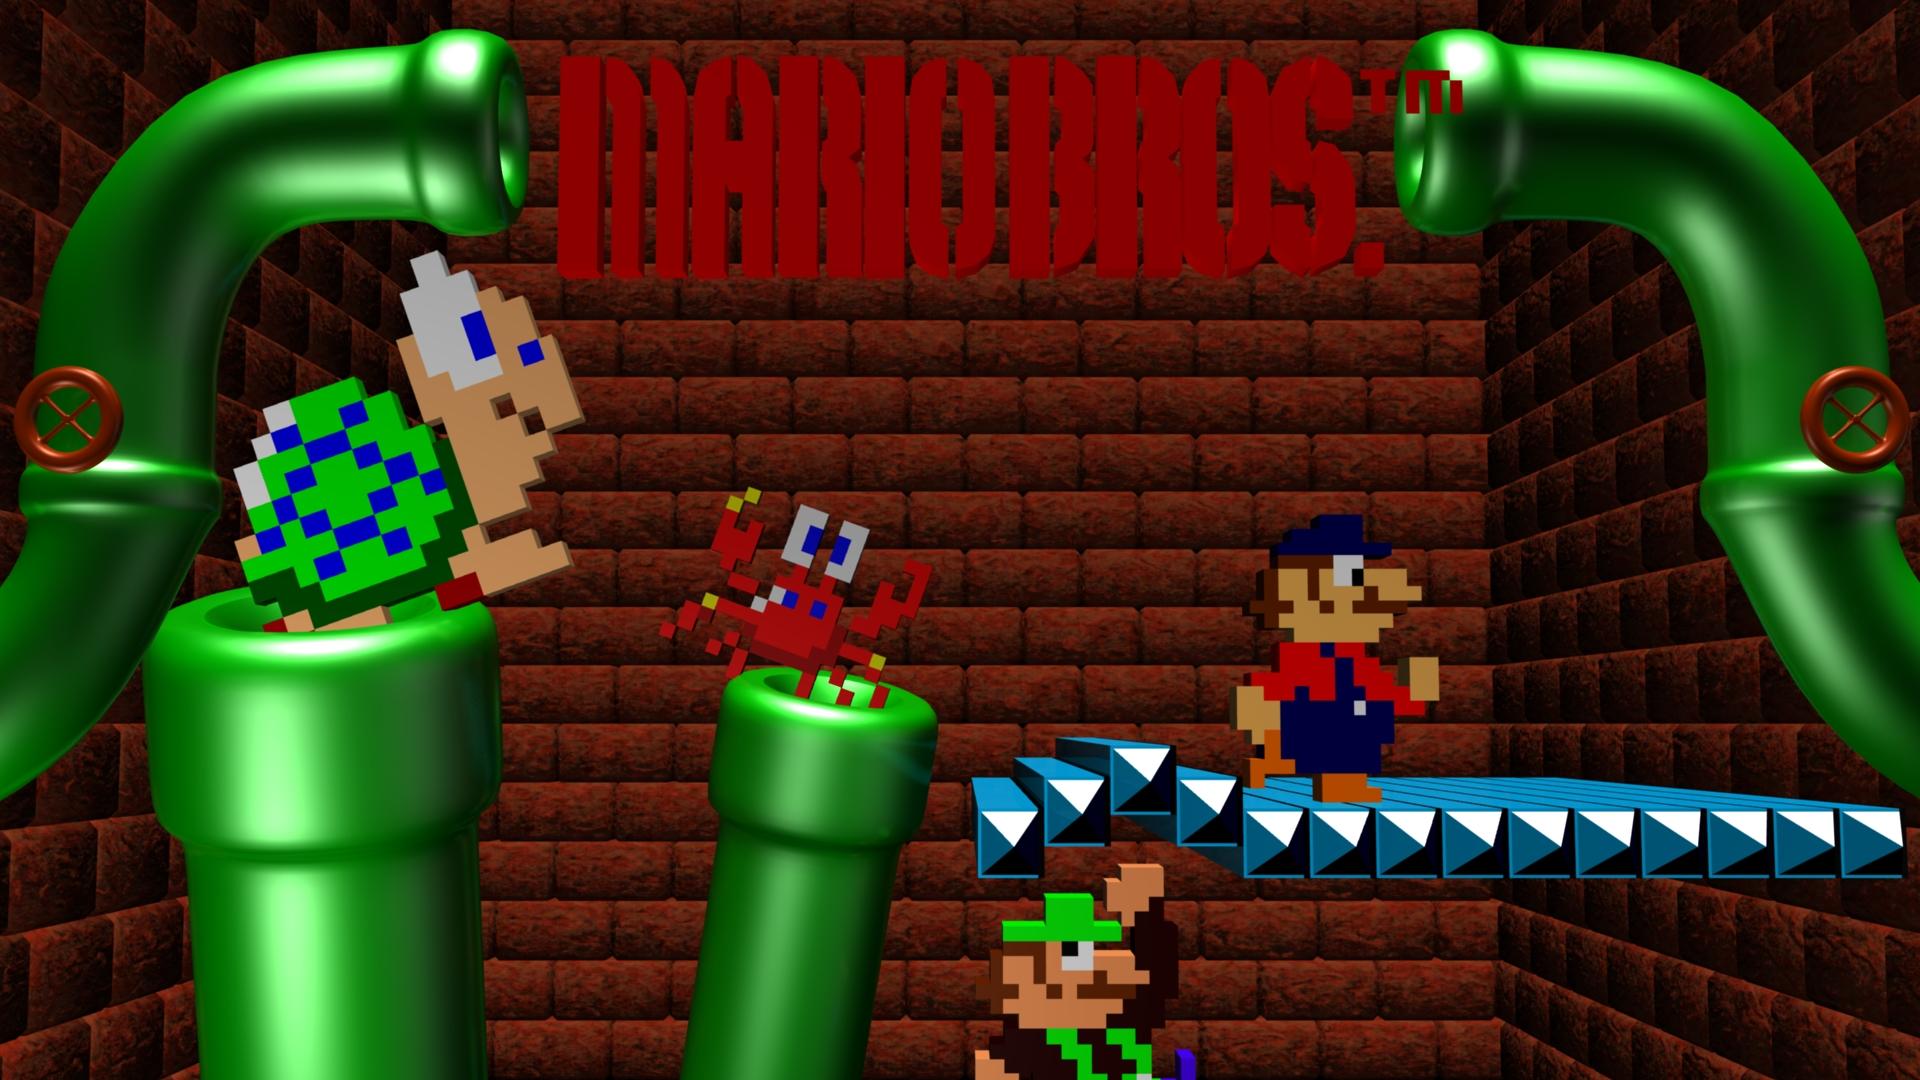 Wallpaper 3d Mario Bros Mario Bros Details Launchbox Games Database